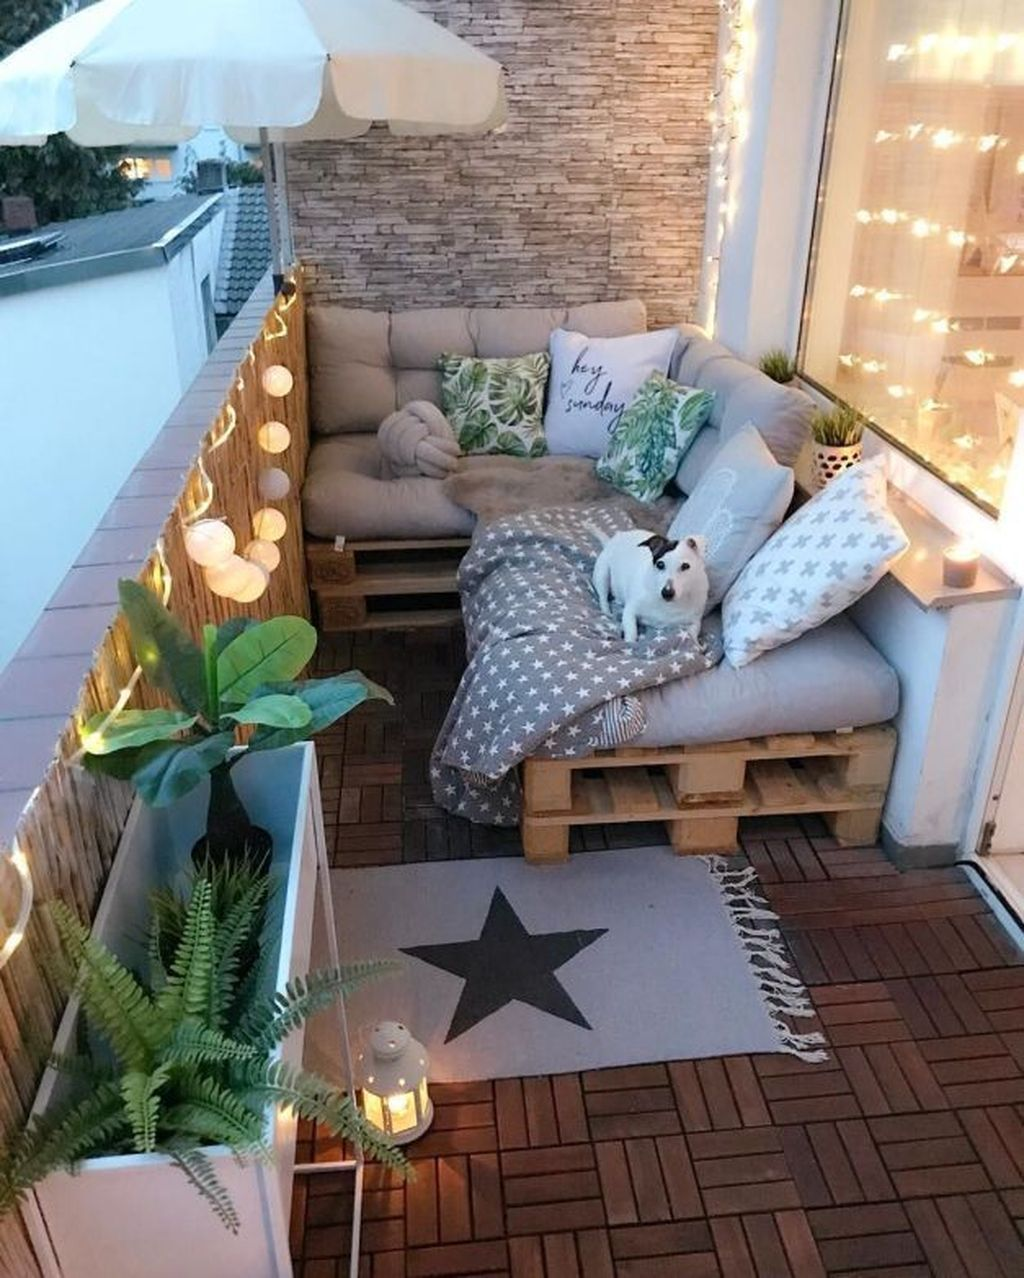 47 Creative And Simple Balcony Decor Ideas Small Balcony Decor